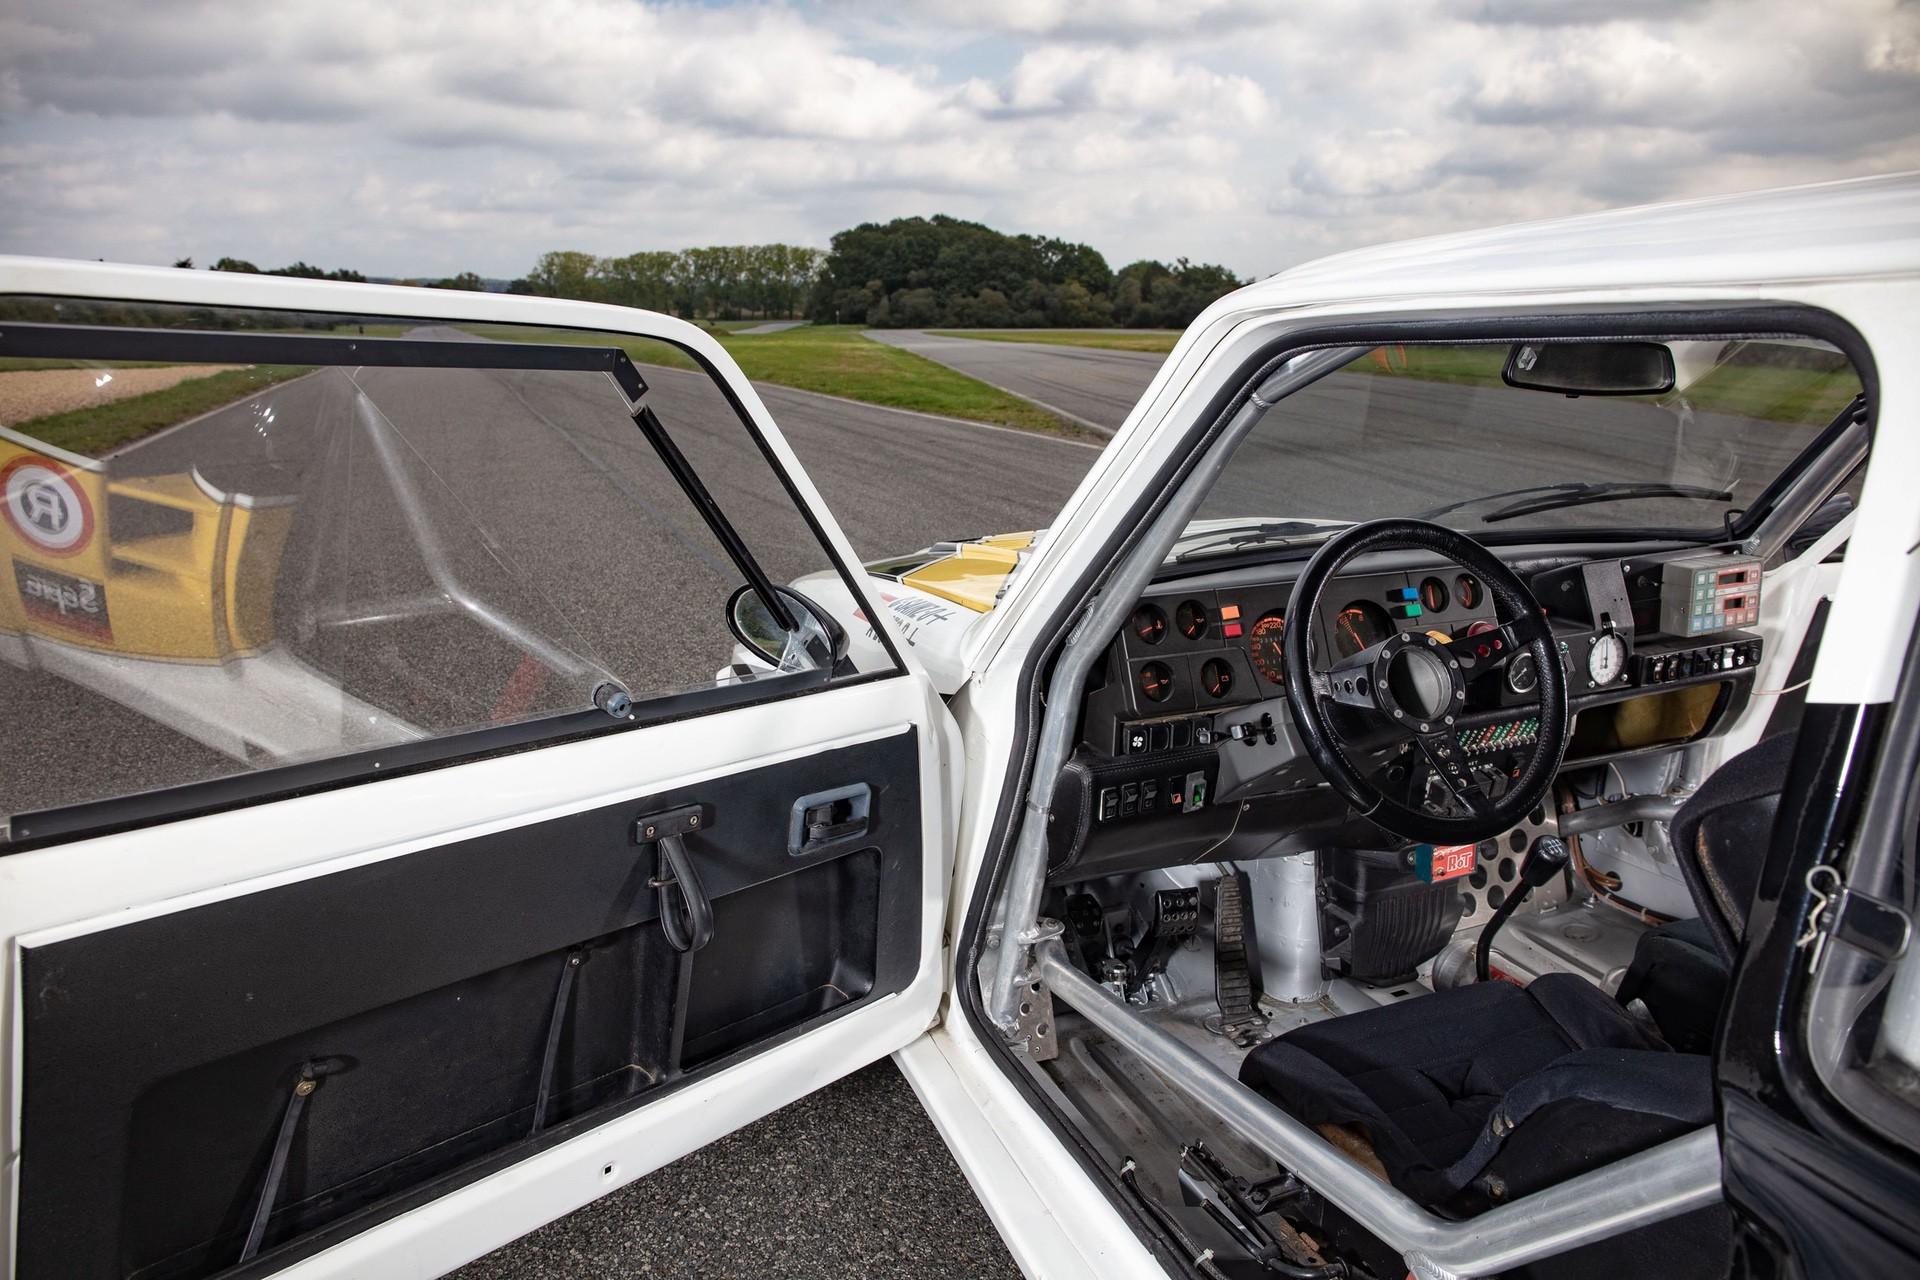 Renault_R5_Maxi_Turbo_ex-Carlos_Sainz-0016